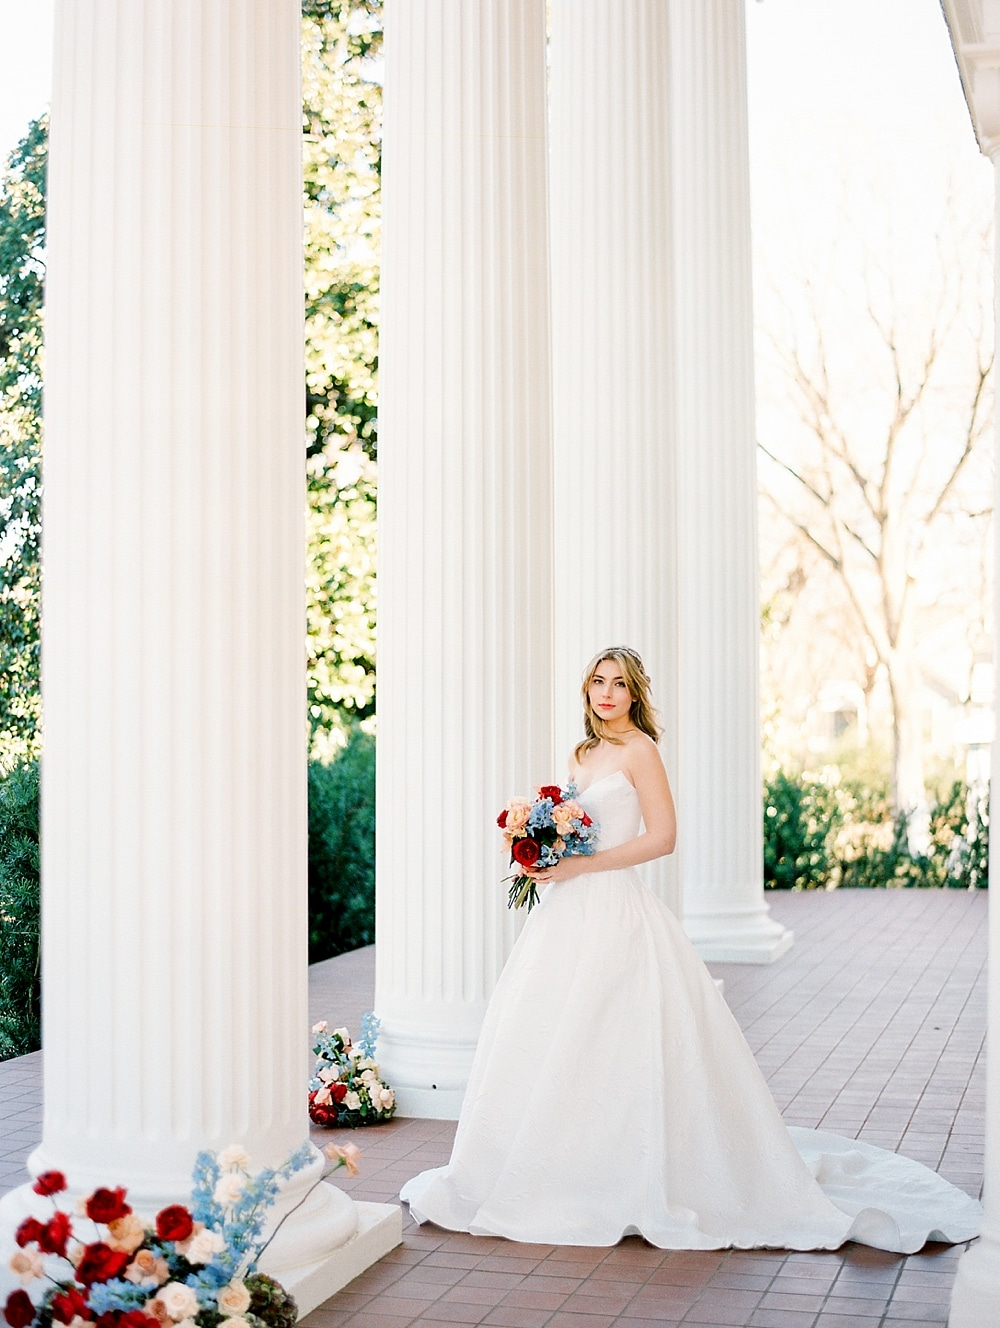 kristin-la-voie-photography-austin-wedding-photographer-woodbine-mansion-18